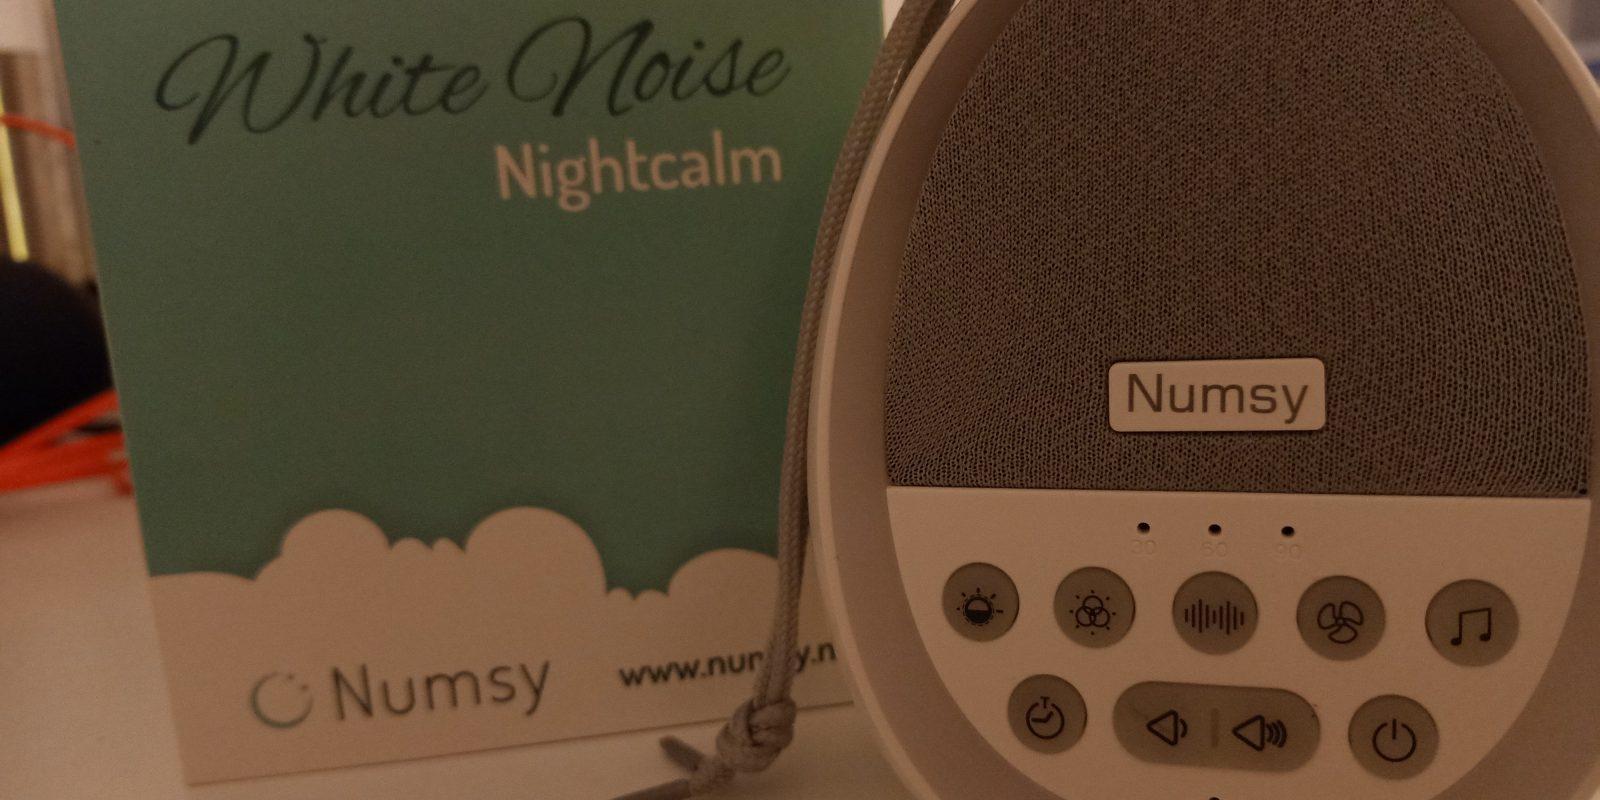 Numsy NightCalm white noise